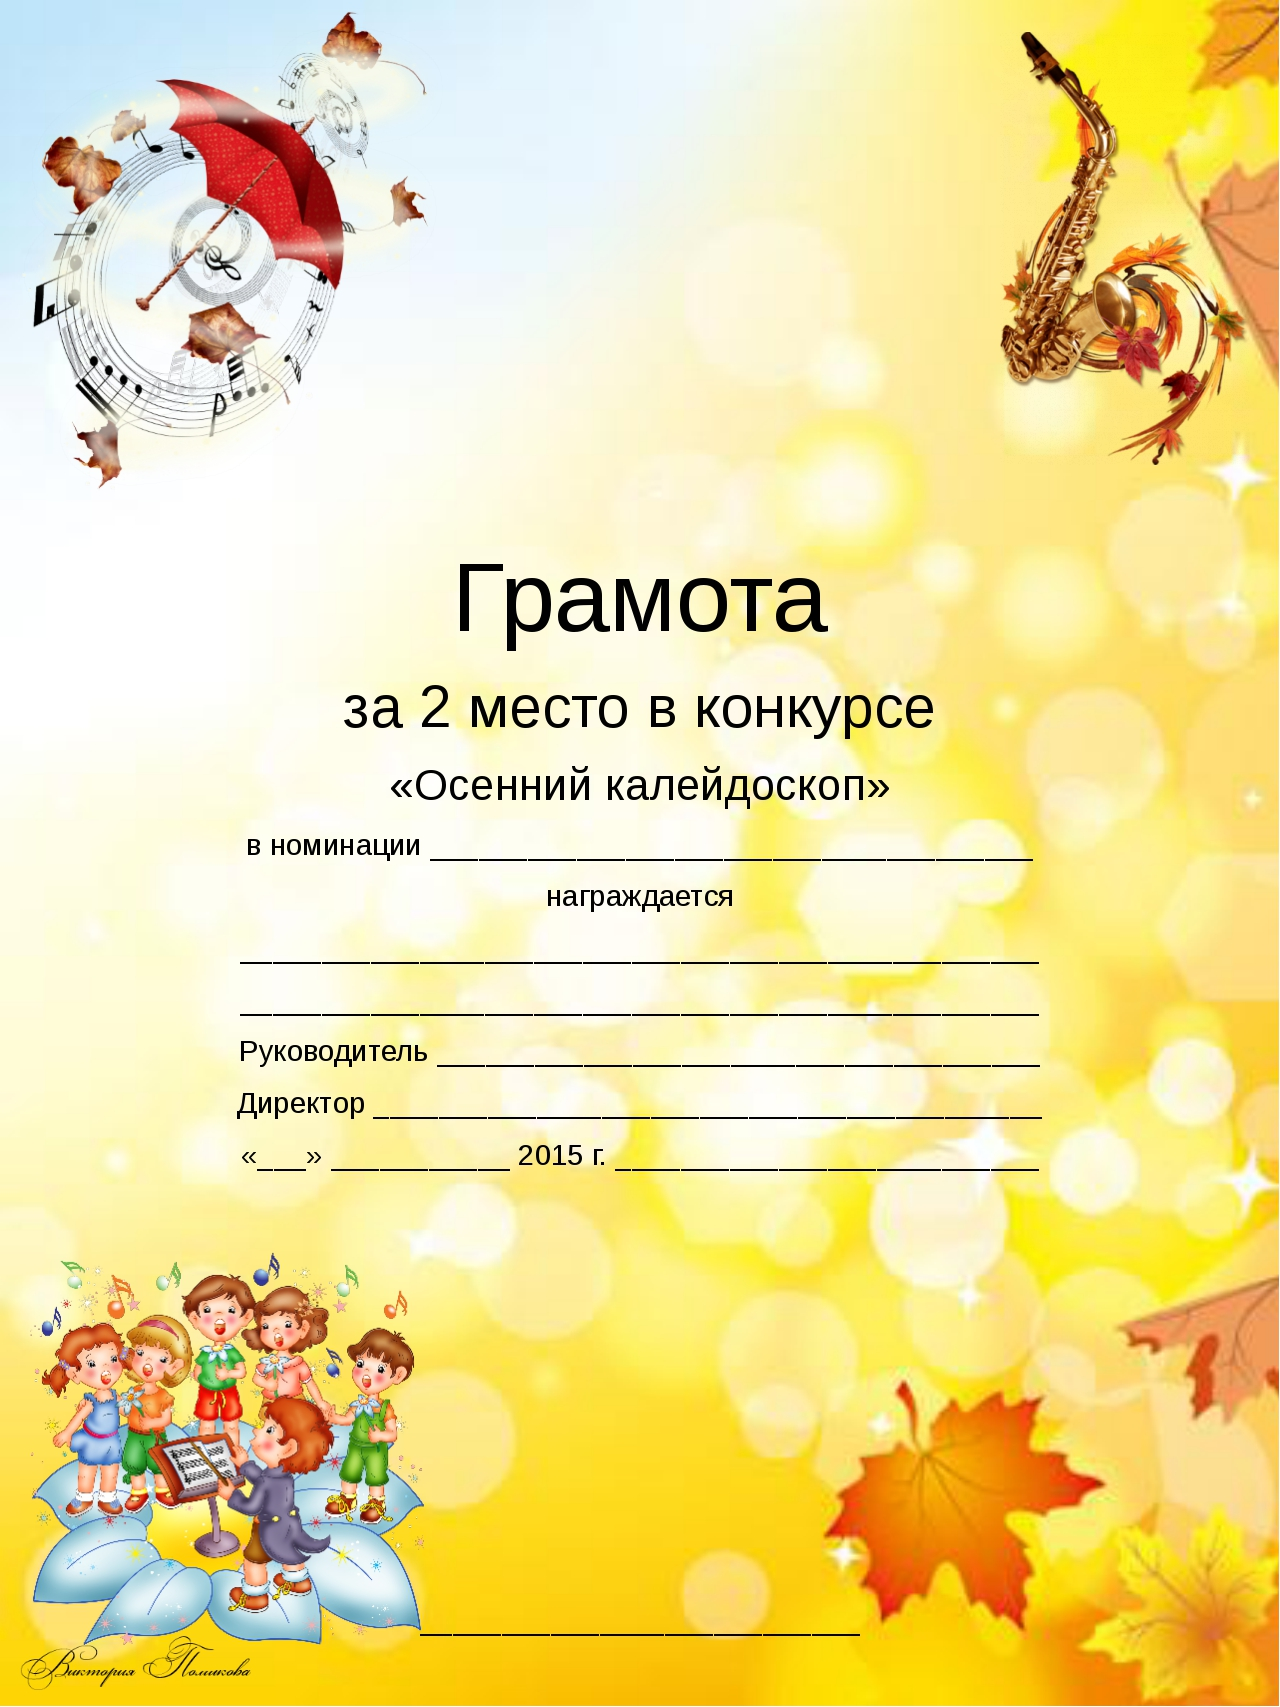 Грамота за 2 место в конкурсе «Осенний калейдоскоп» в номинации _____________...